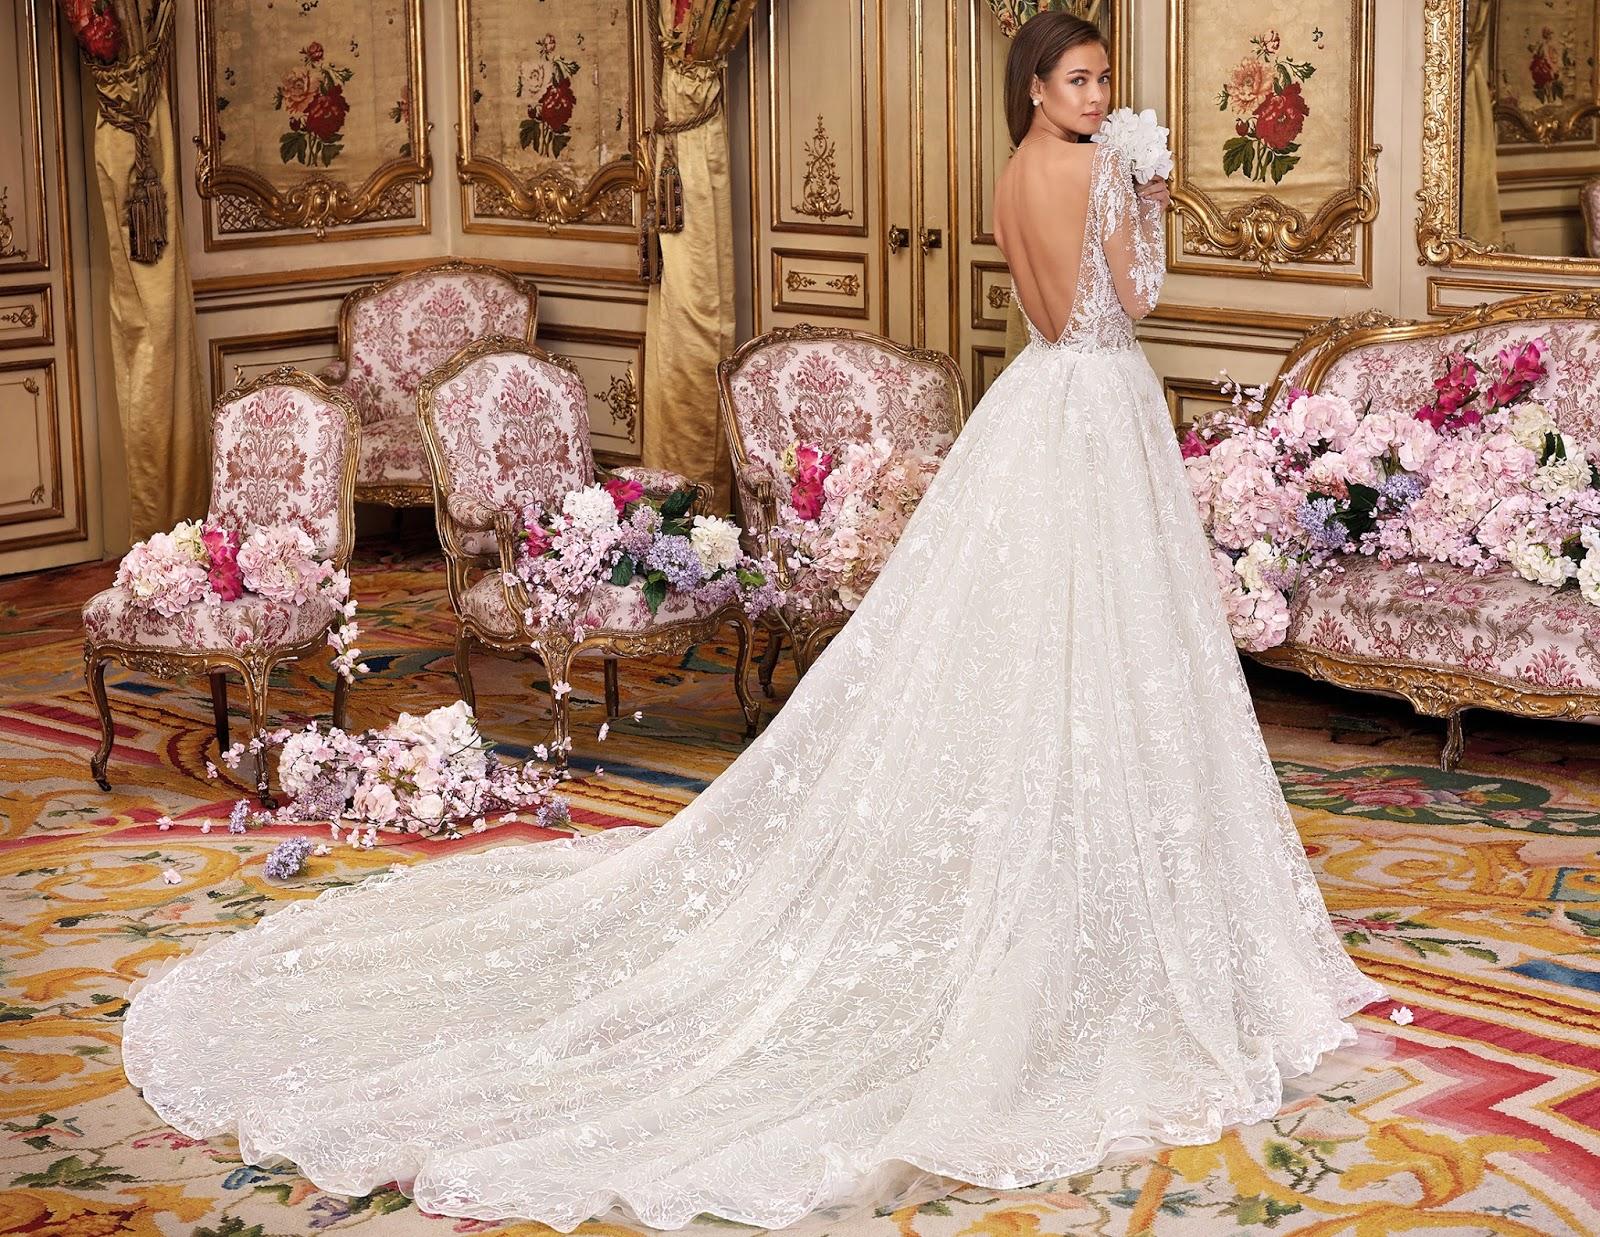 Demetrios Wedding Dress Prices 69 Trend Dreams do bee reality